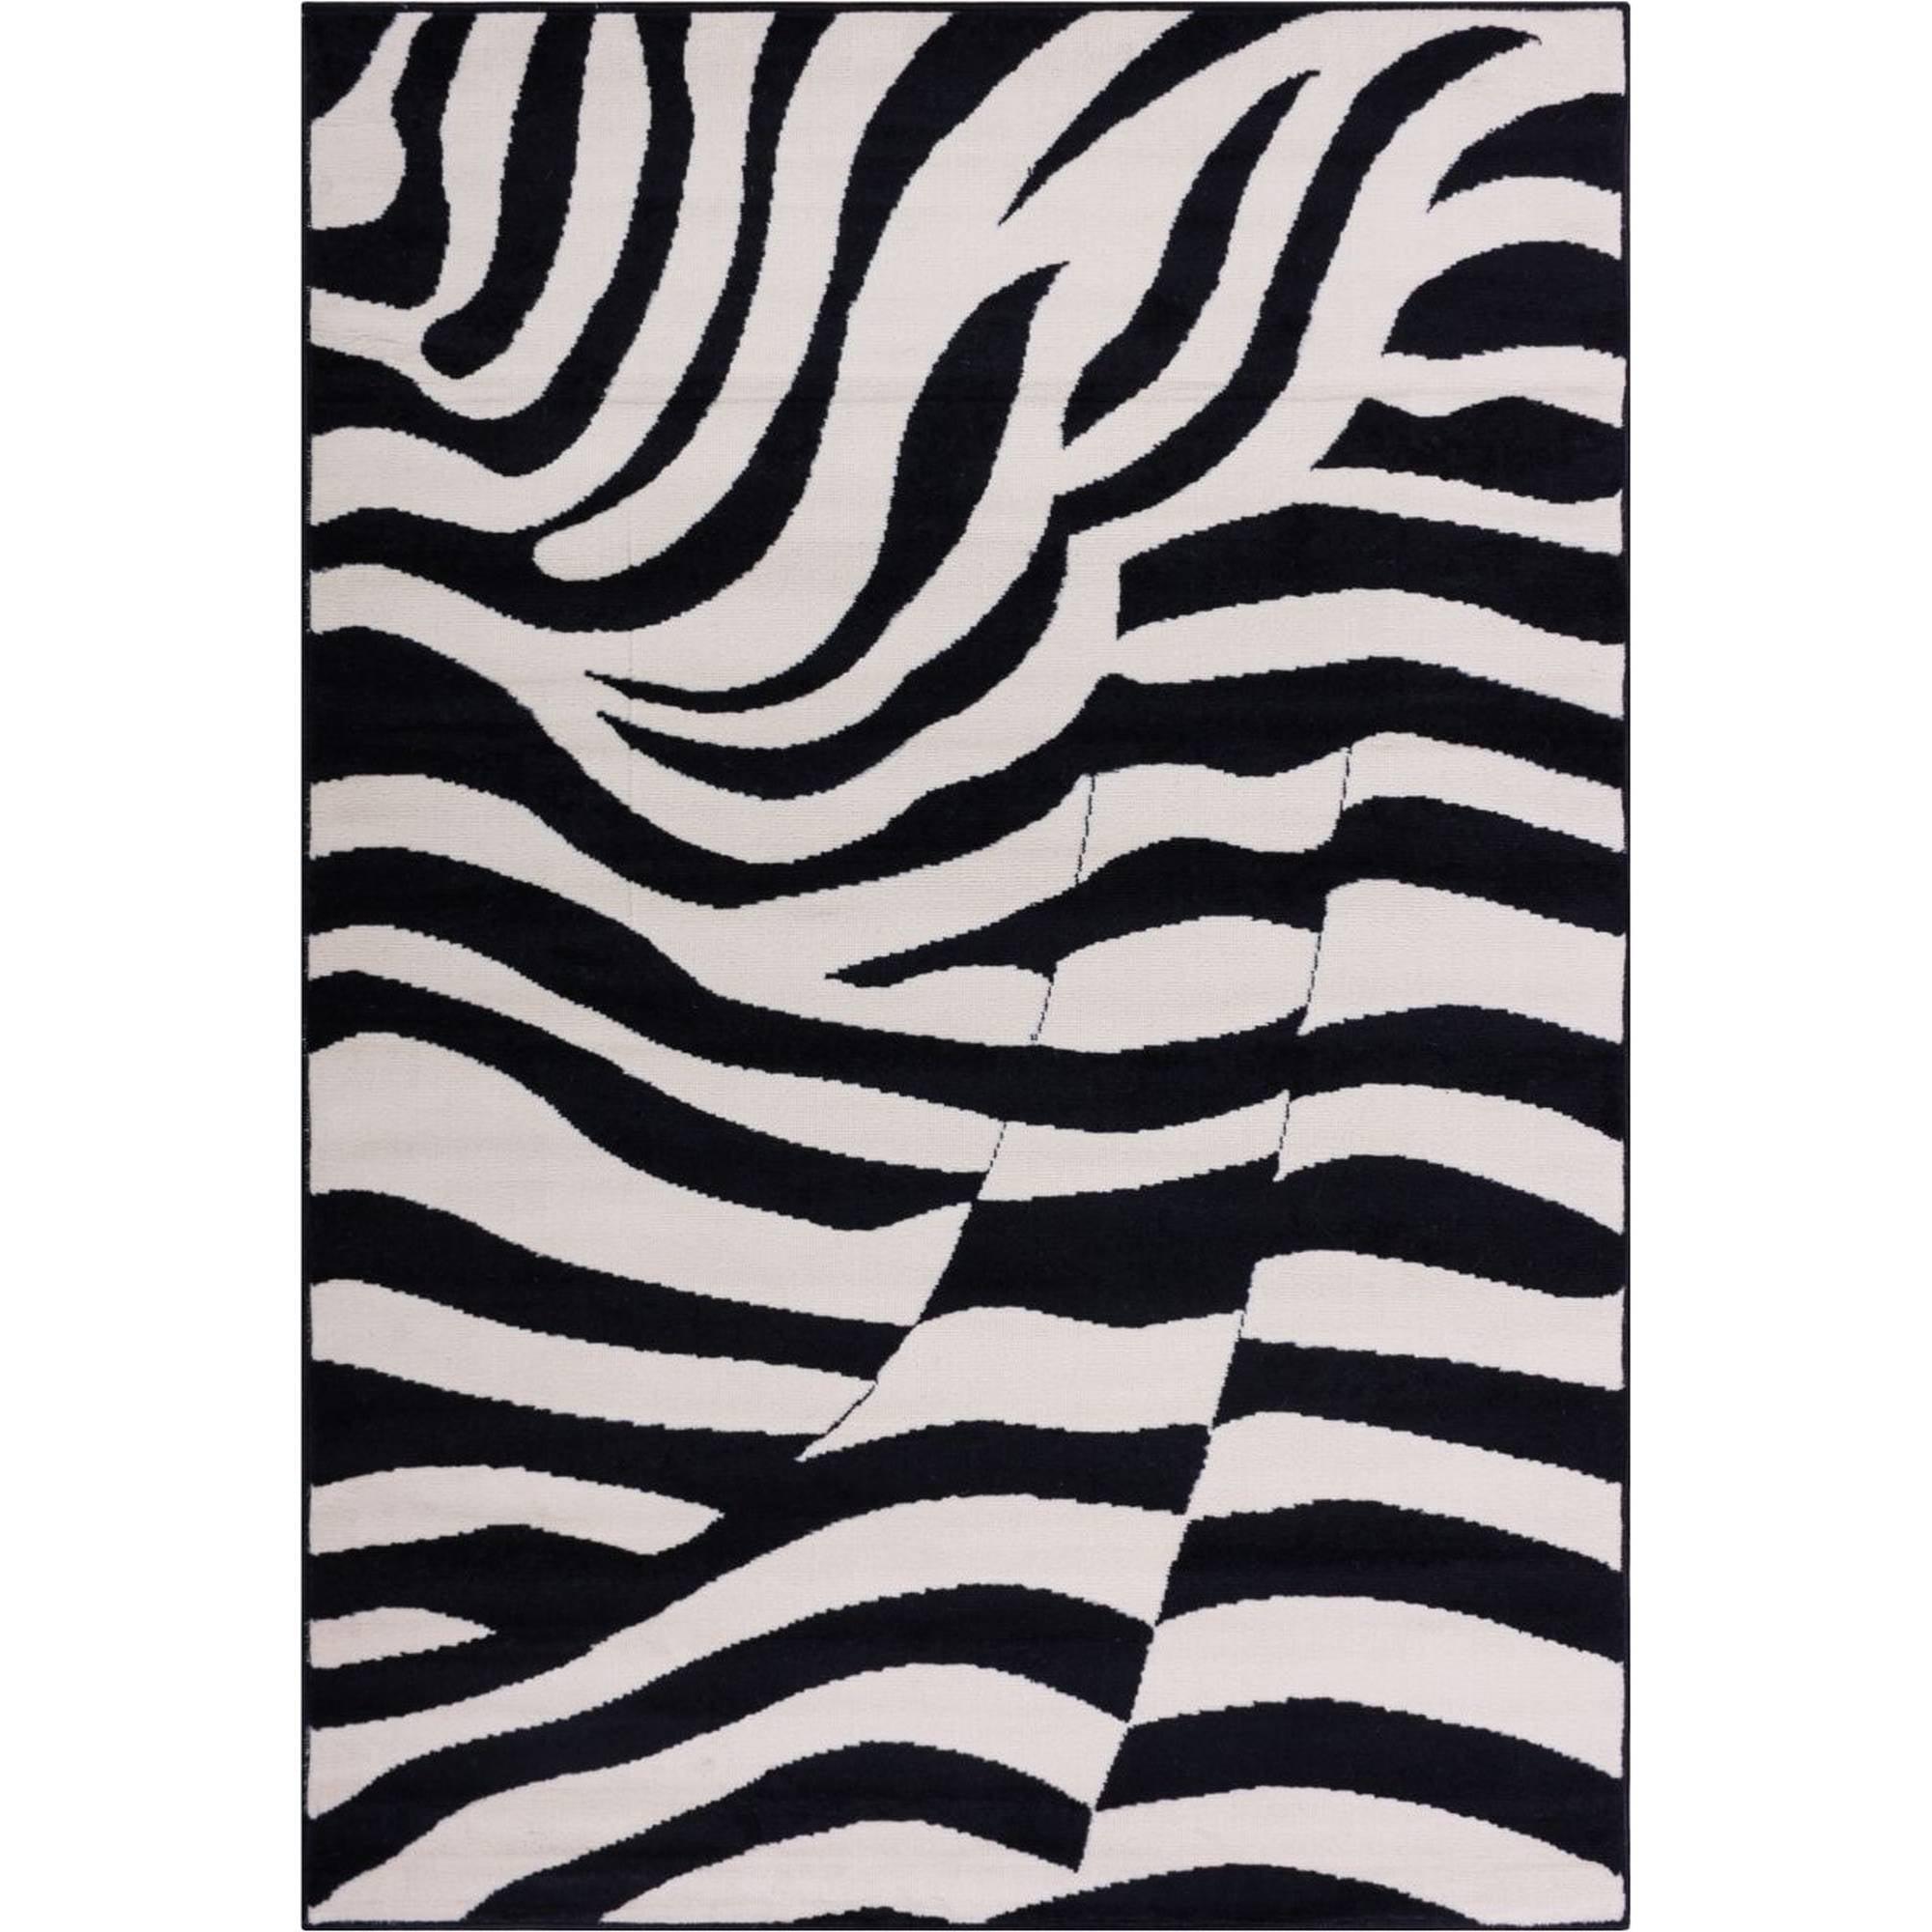 Well Woven Miami Zebra Animal Print Area Rug, Black